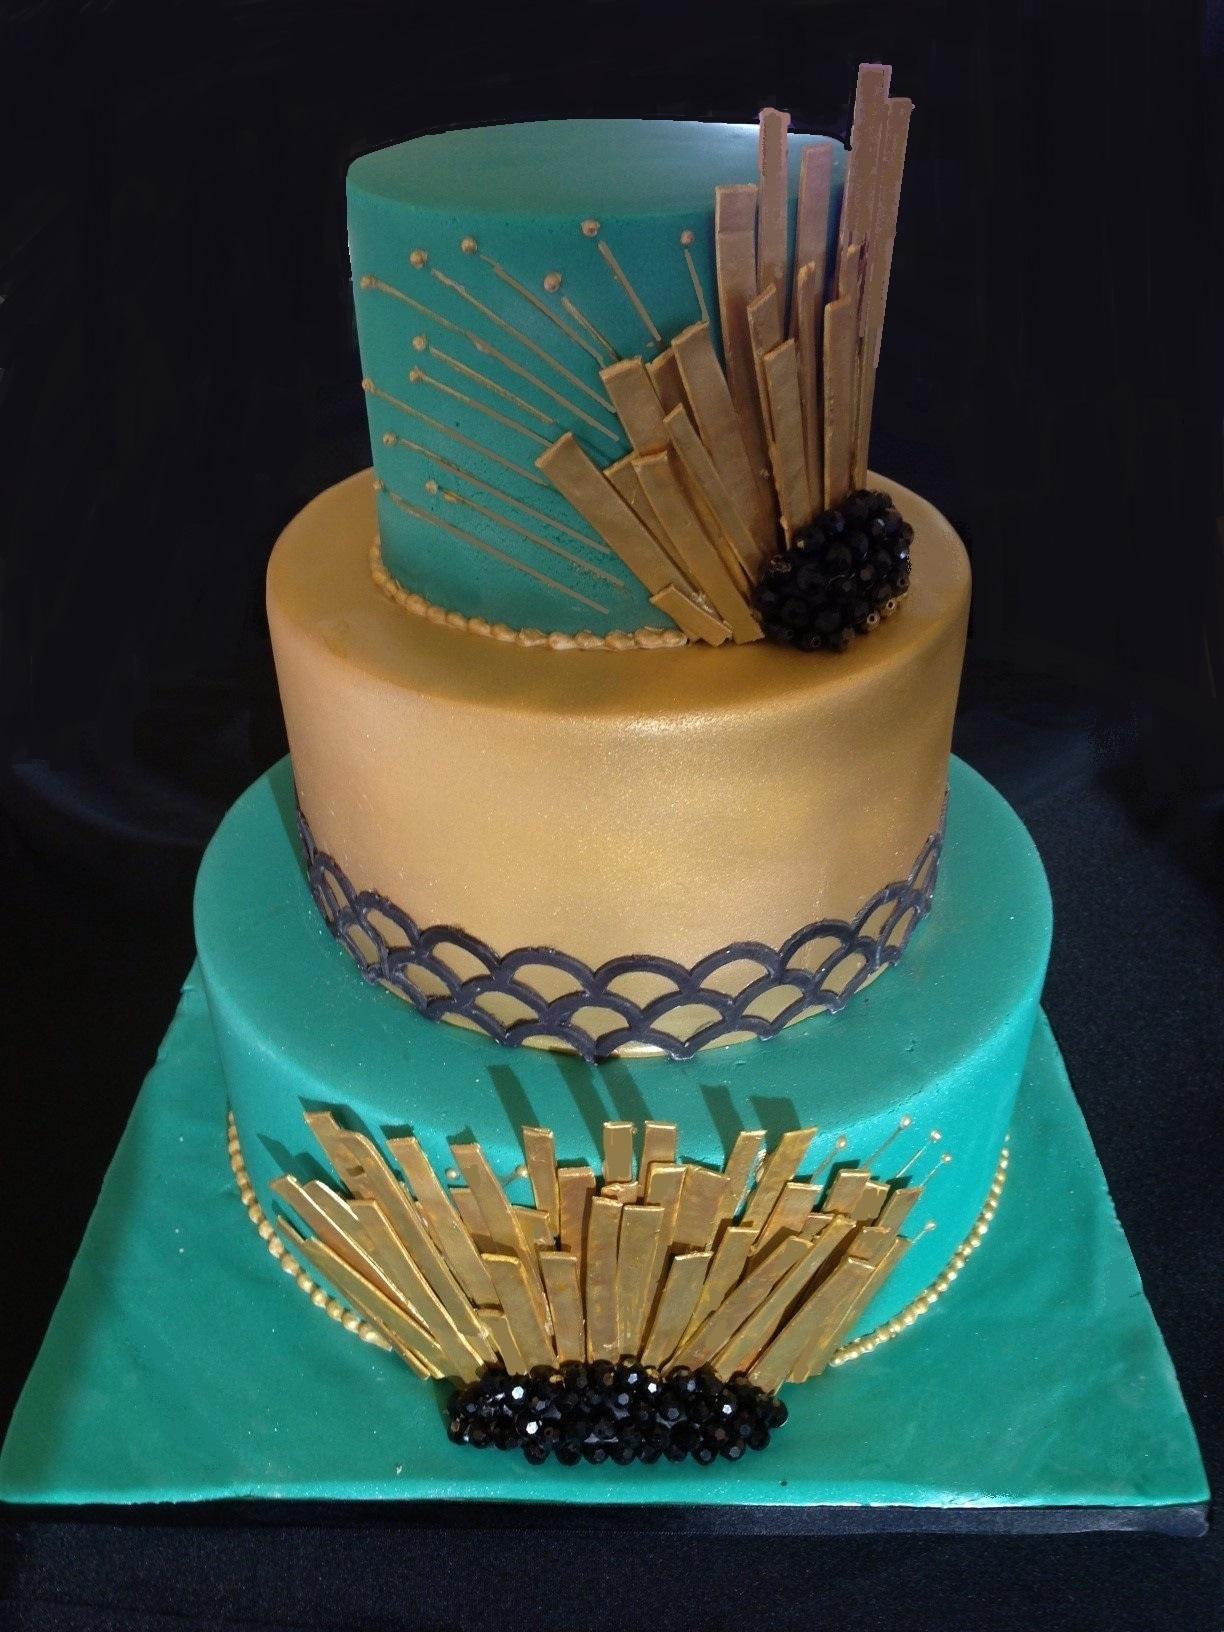 The Great Gatsby Theme Wedding Cake